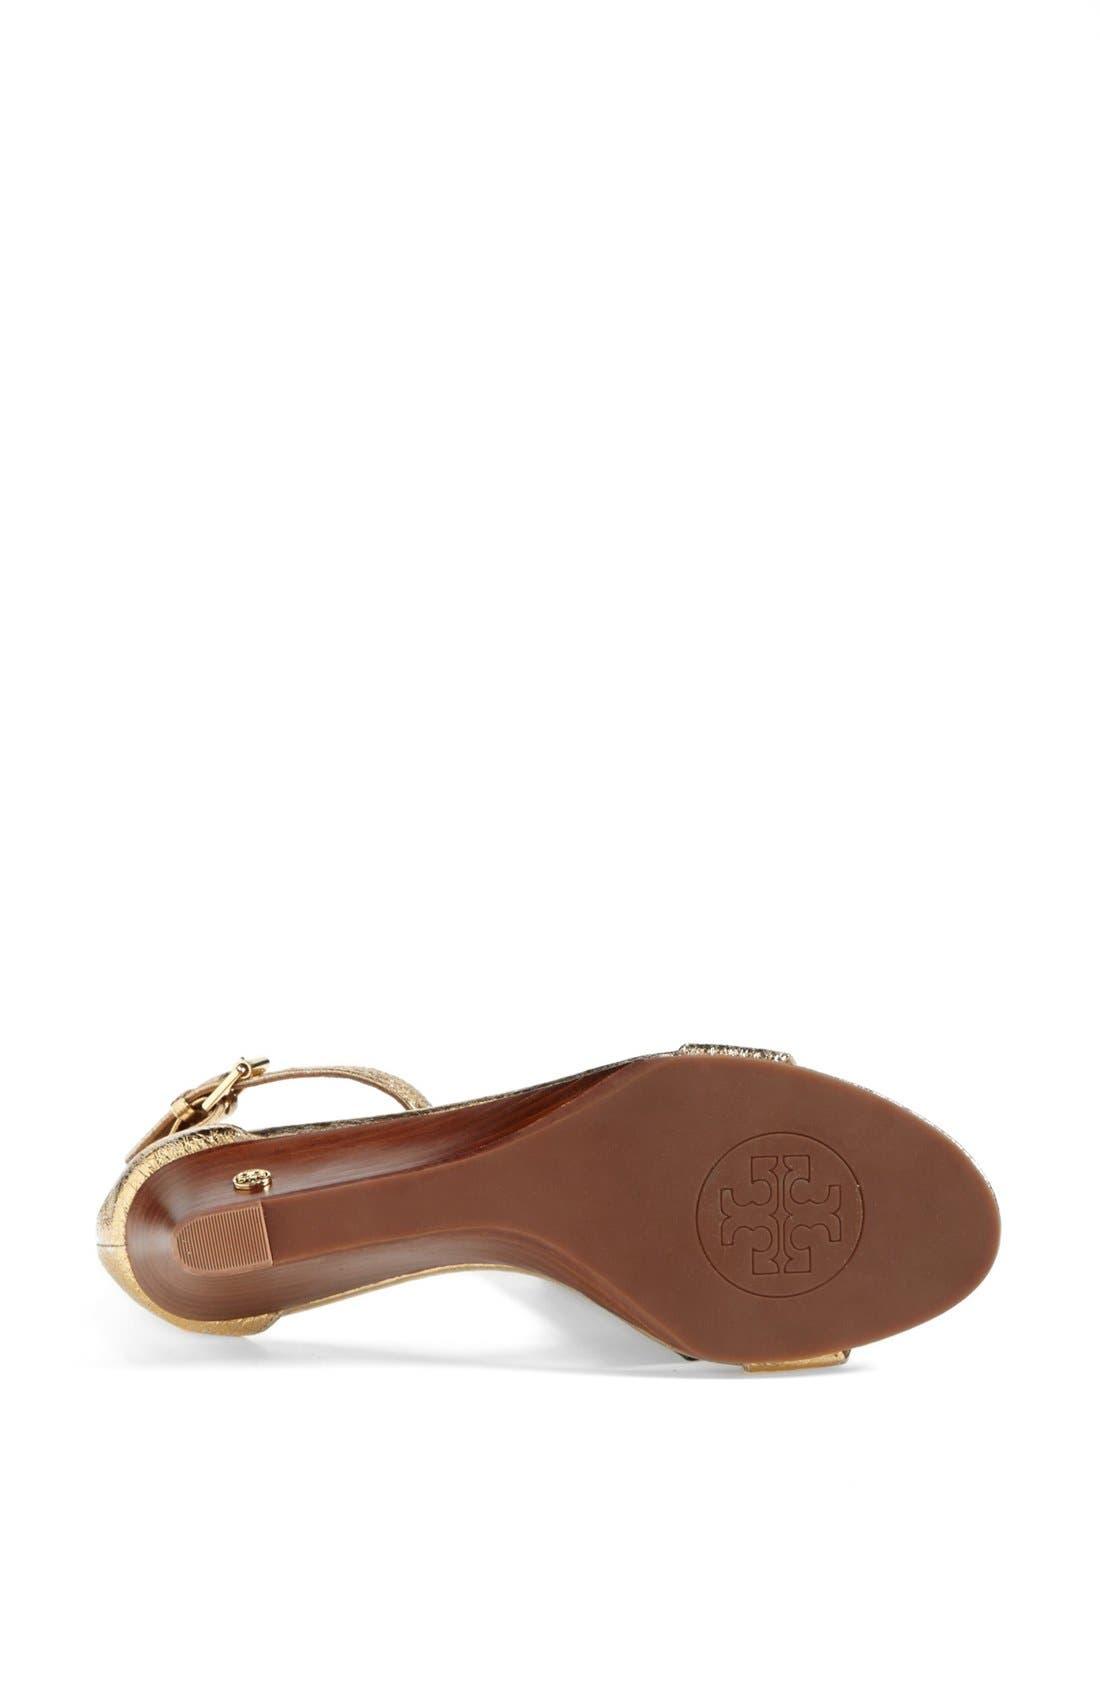 Alternate Image 3  - Tory Burch 'Savannah' Wedge Sandal